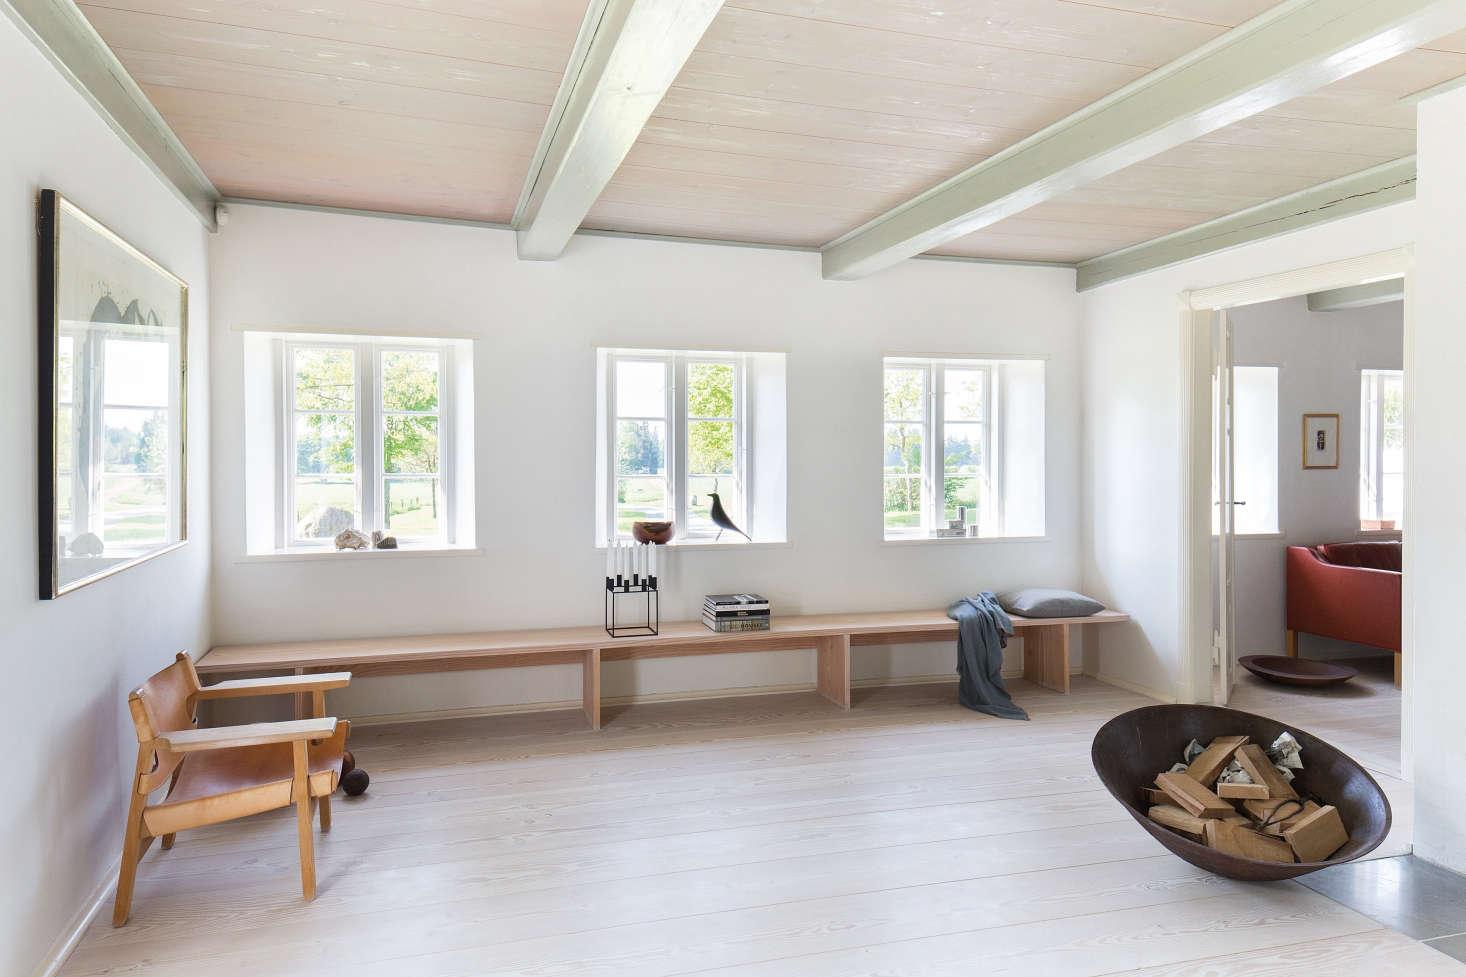 The Dinesen Family House: A Historic Renovation for Danish Design ...